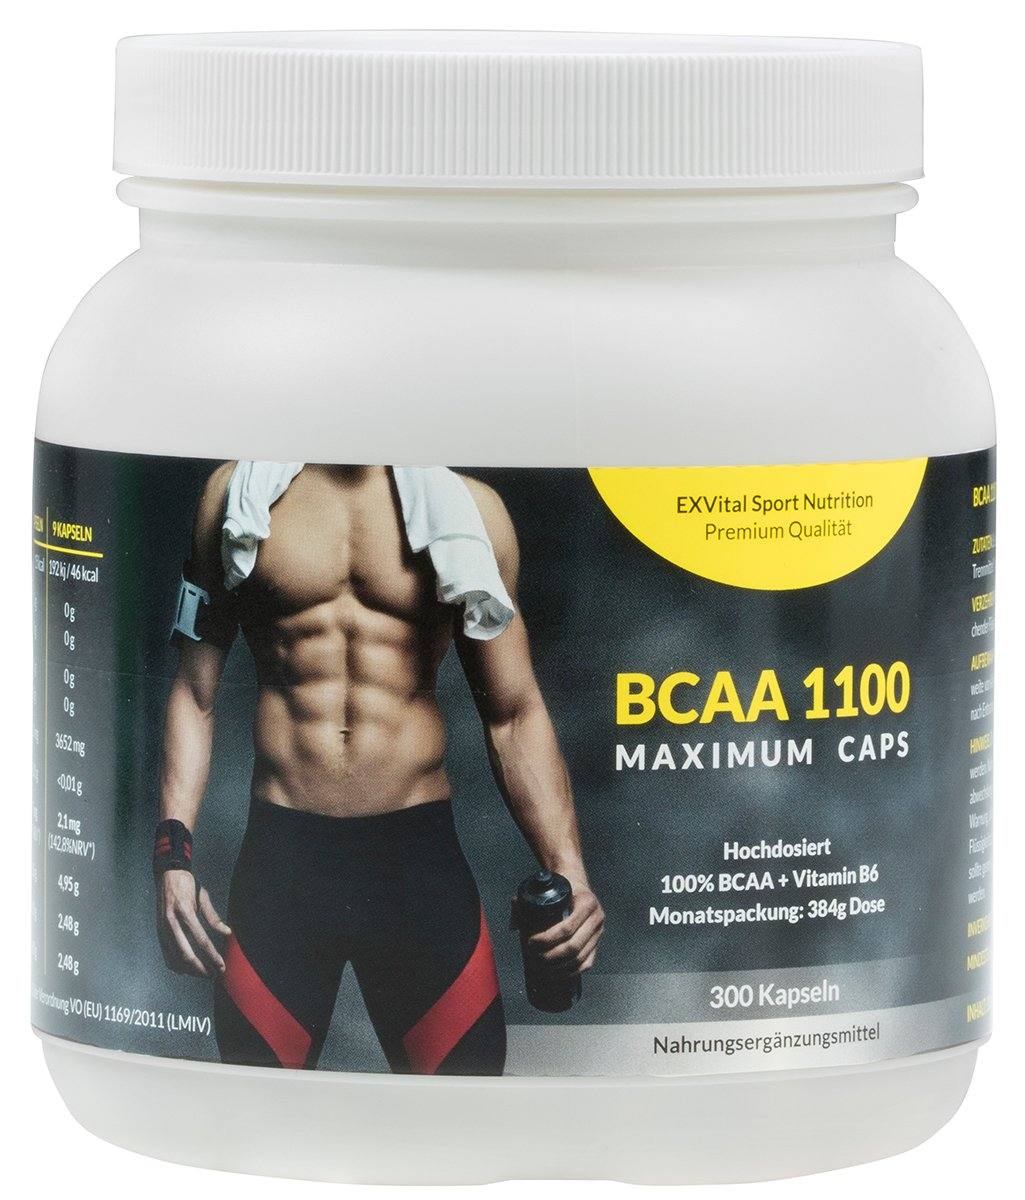 EXVital BCAA 1100最大剂量支链氨基酸胶囊